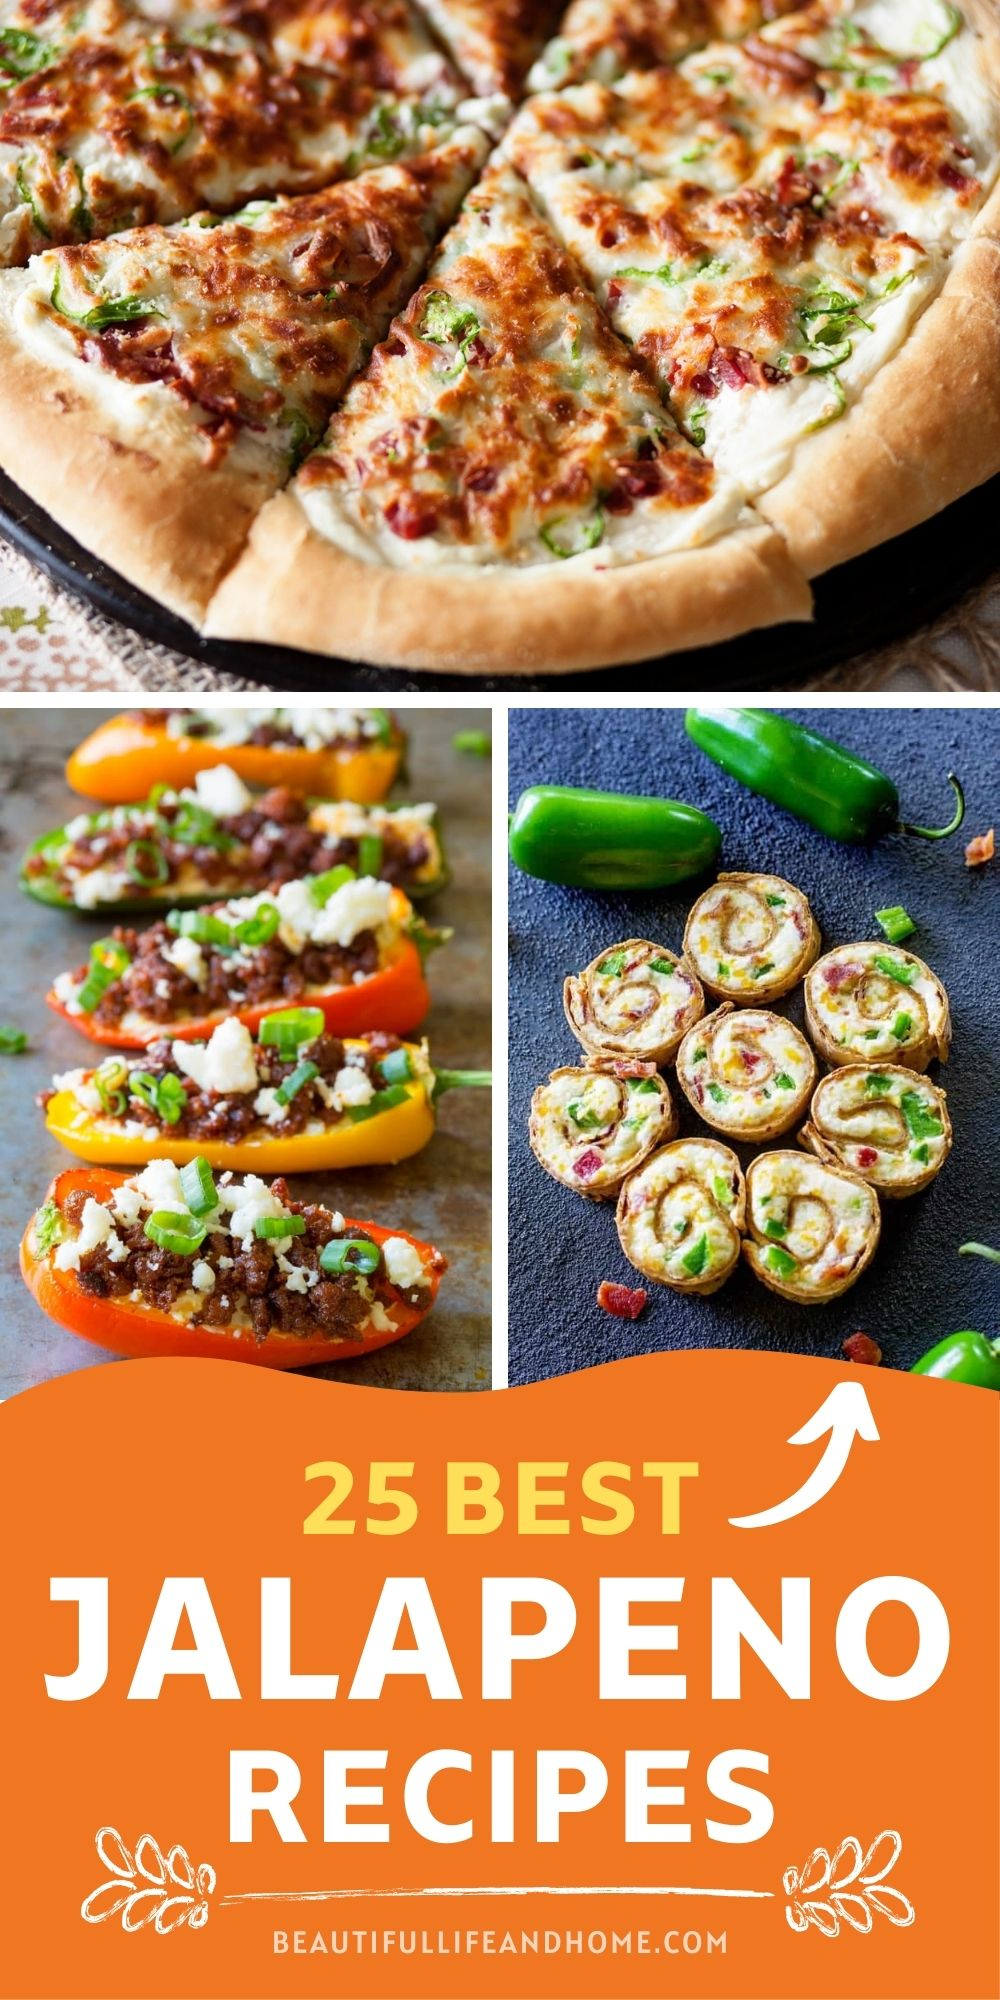 25 Tasty Jalapeno Appetizers